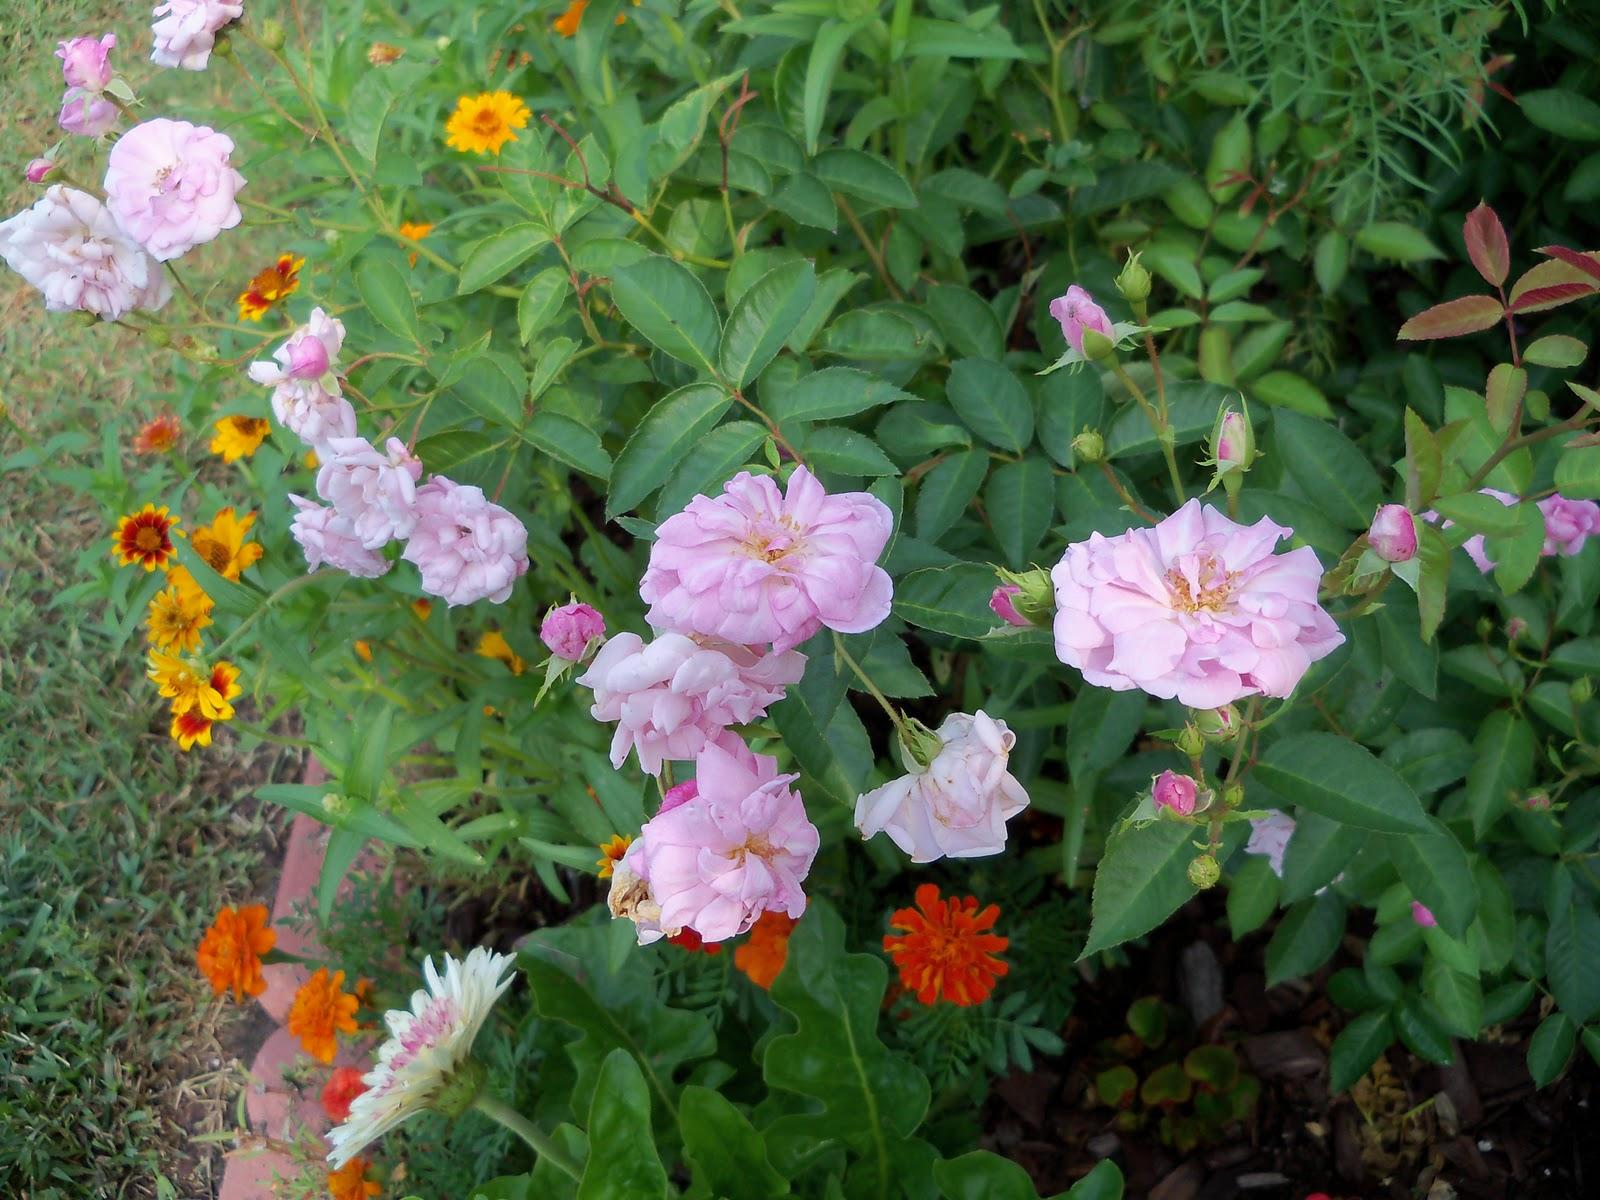 Gardening 2010, Part Two - 101_3266.JPG